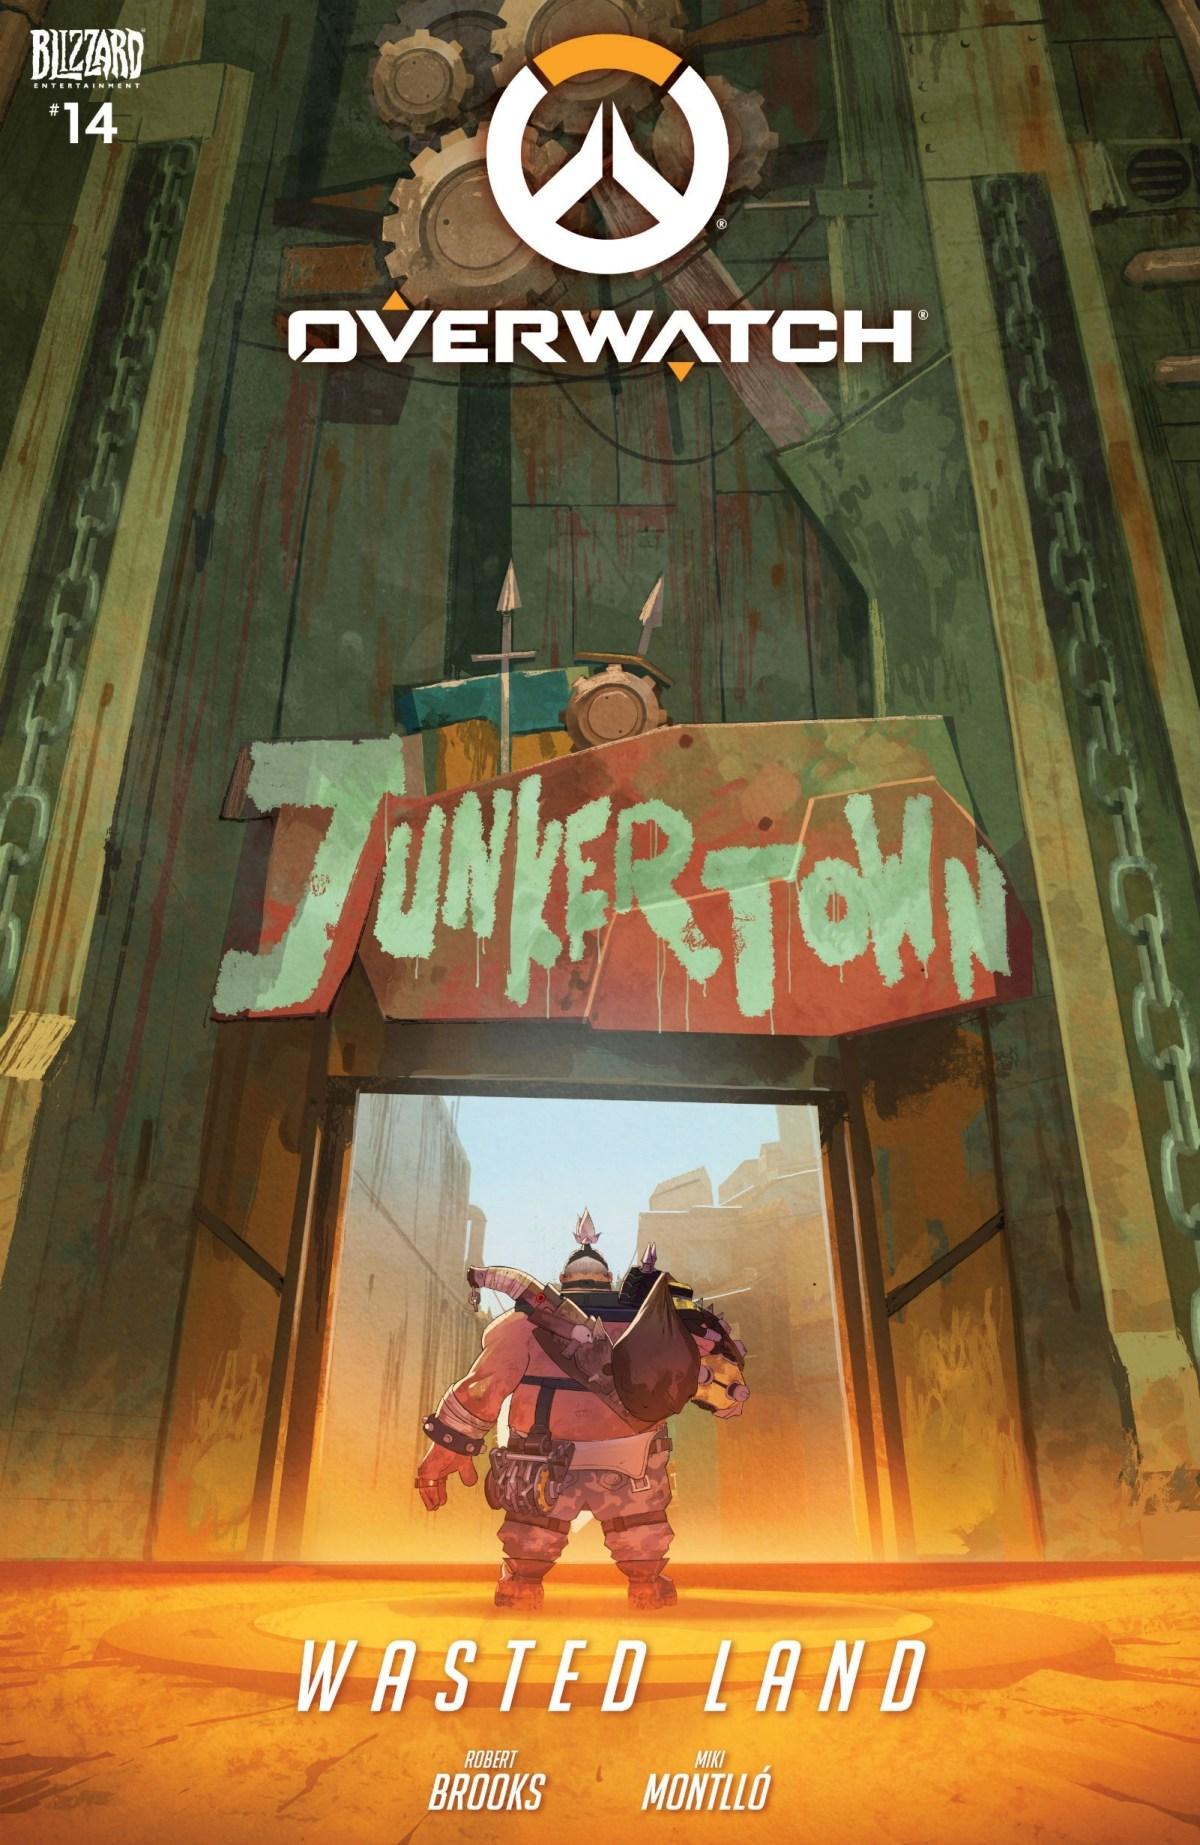 roadhog-sera-siguiente-protagonista-comic-overwatch-frikigamers.com